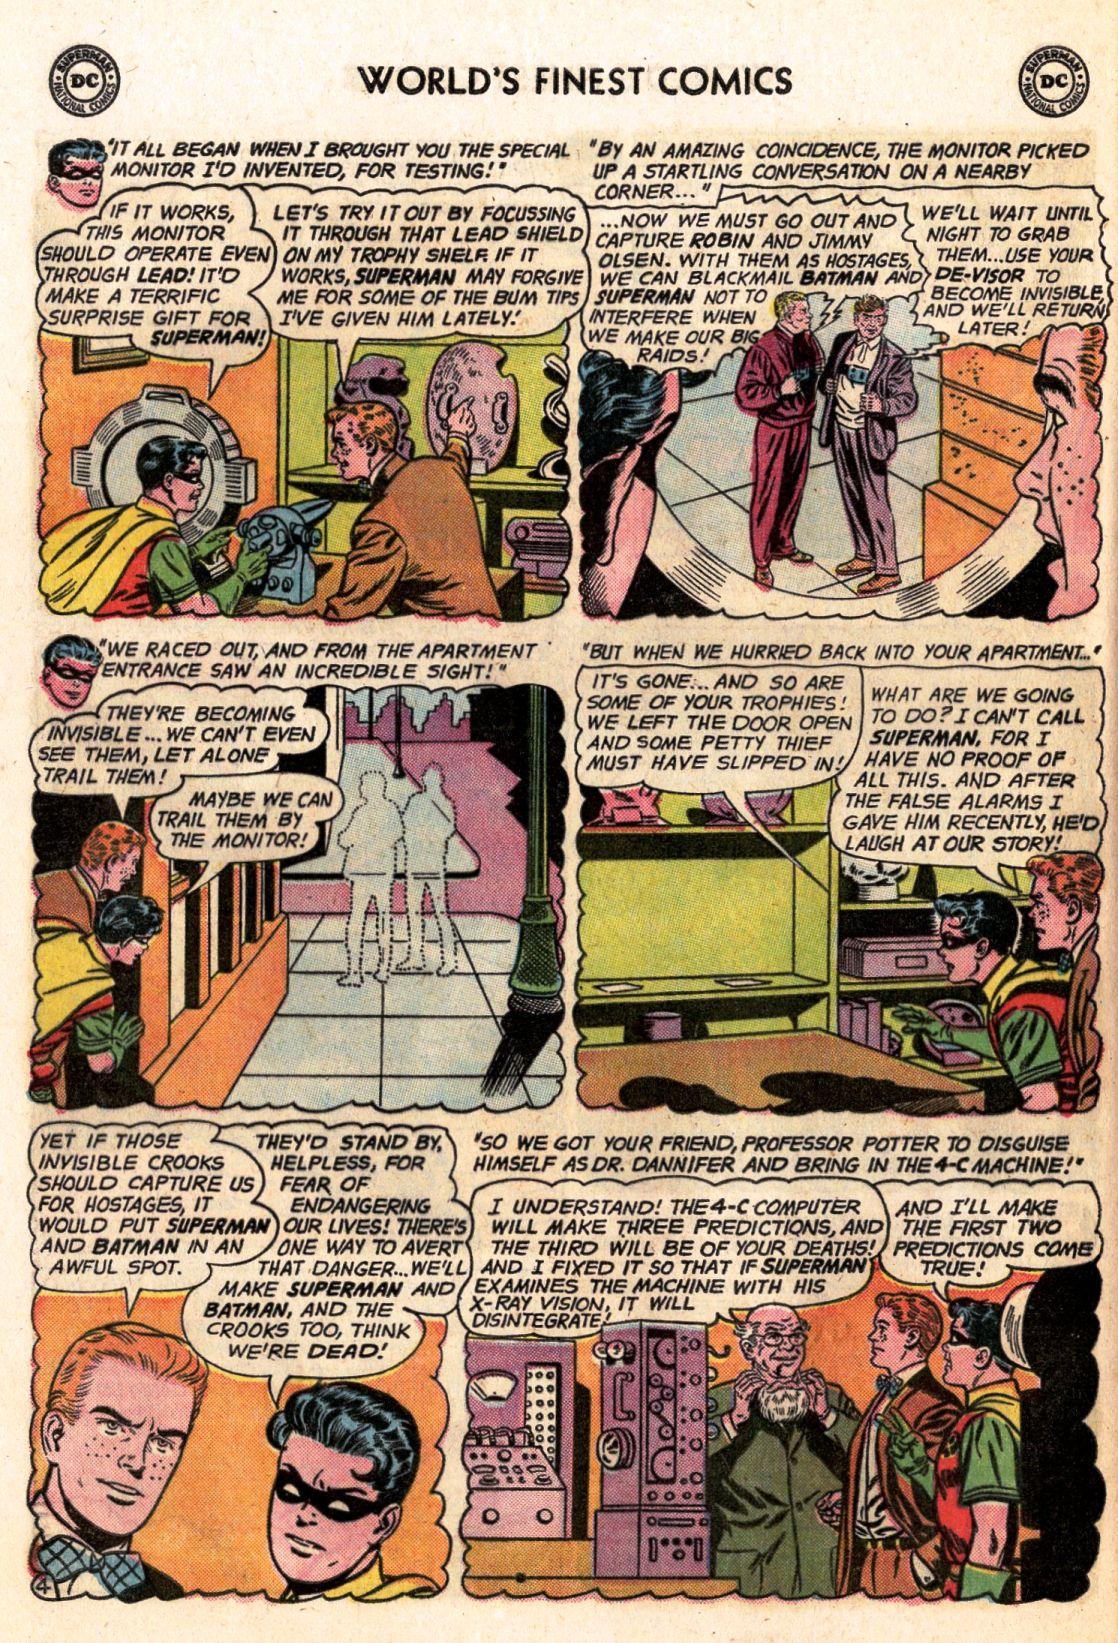 Read online World's Finest Comics comic -  Issue #141 - 16